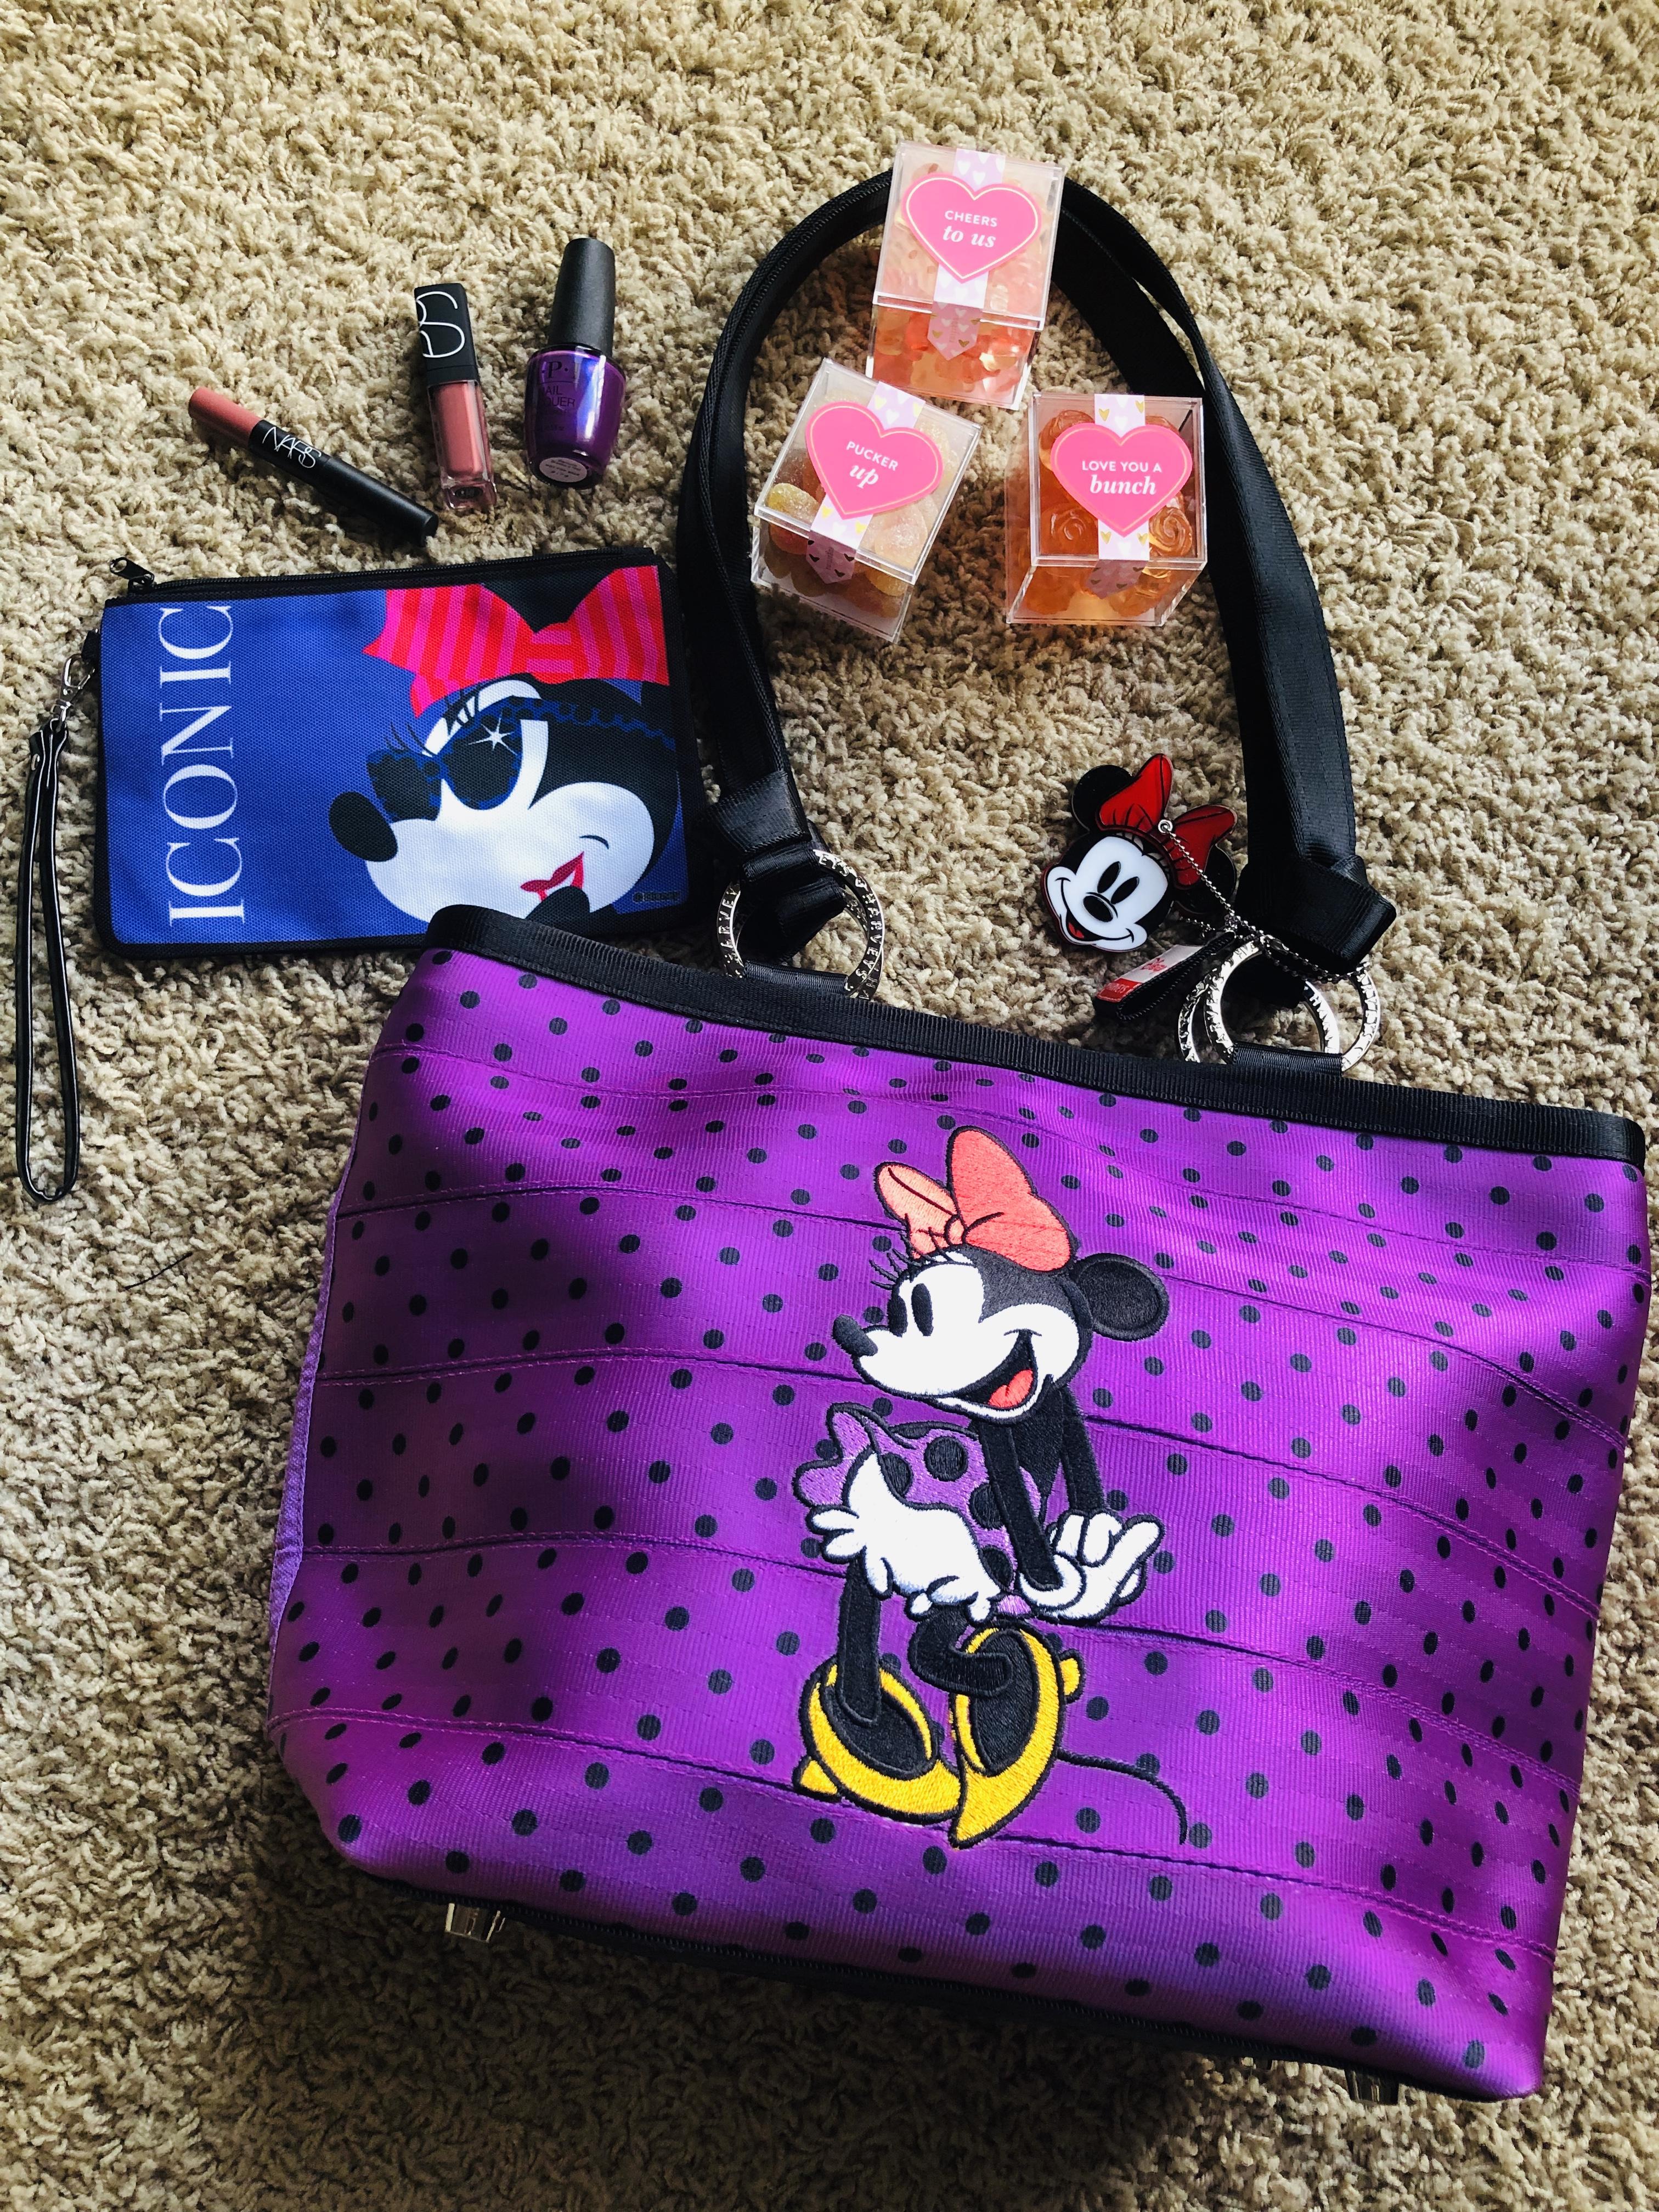 What's In My Bag: Ring Tote Disney Minnie Polka Dot